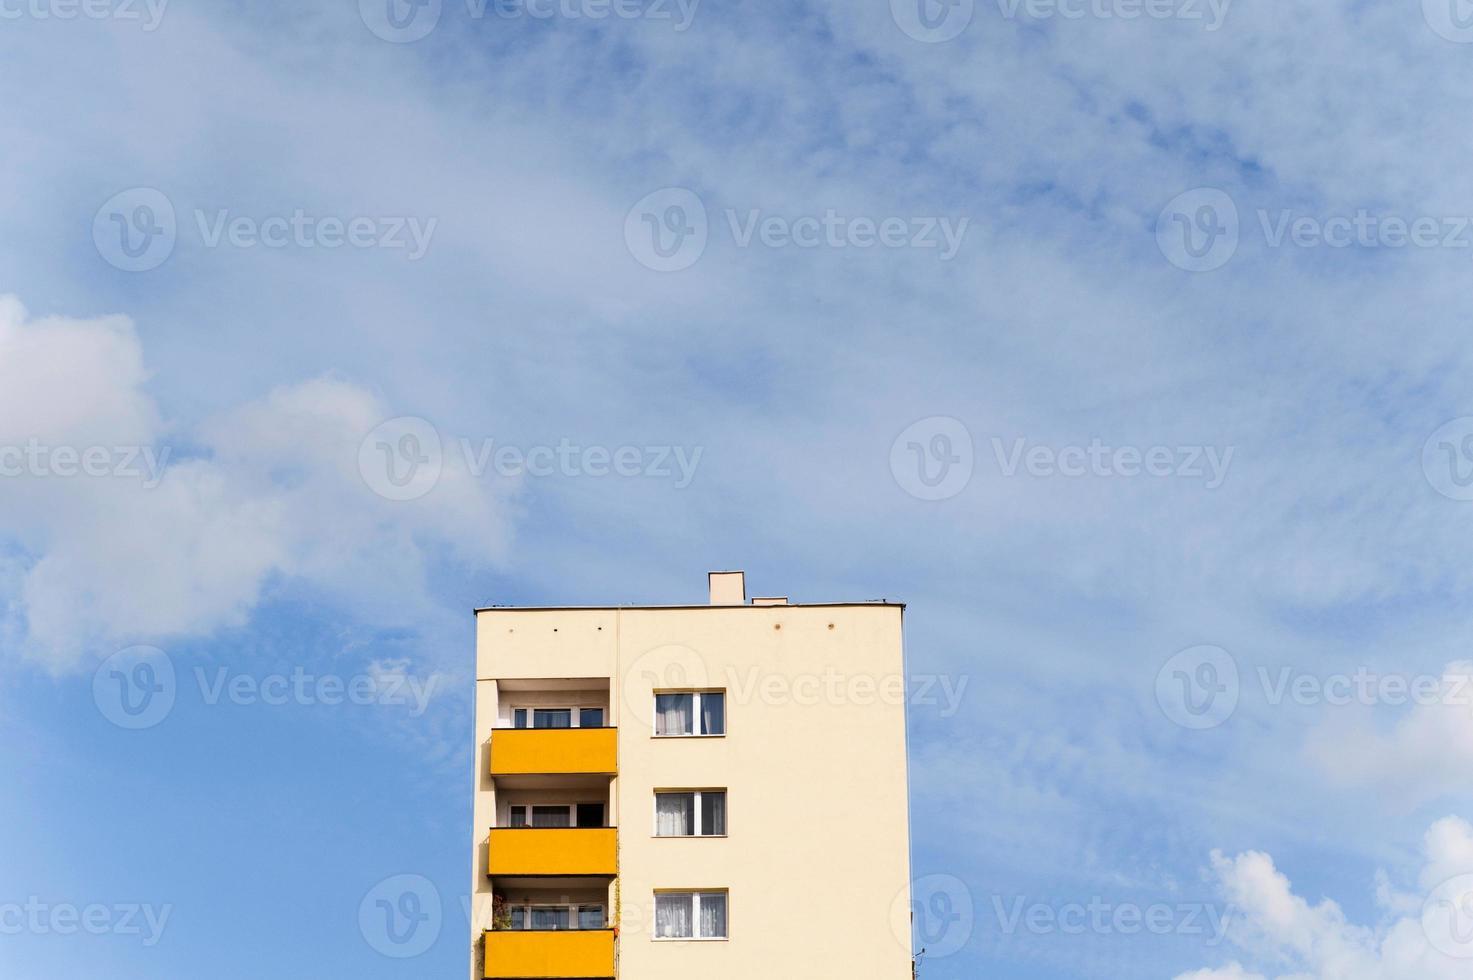 bostadshus med kopieringsutrymme foto